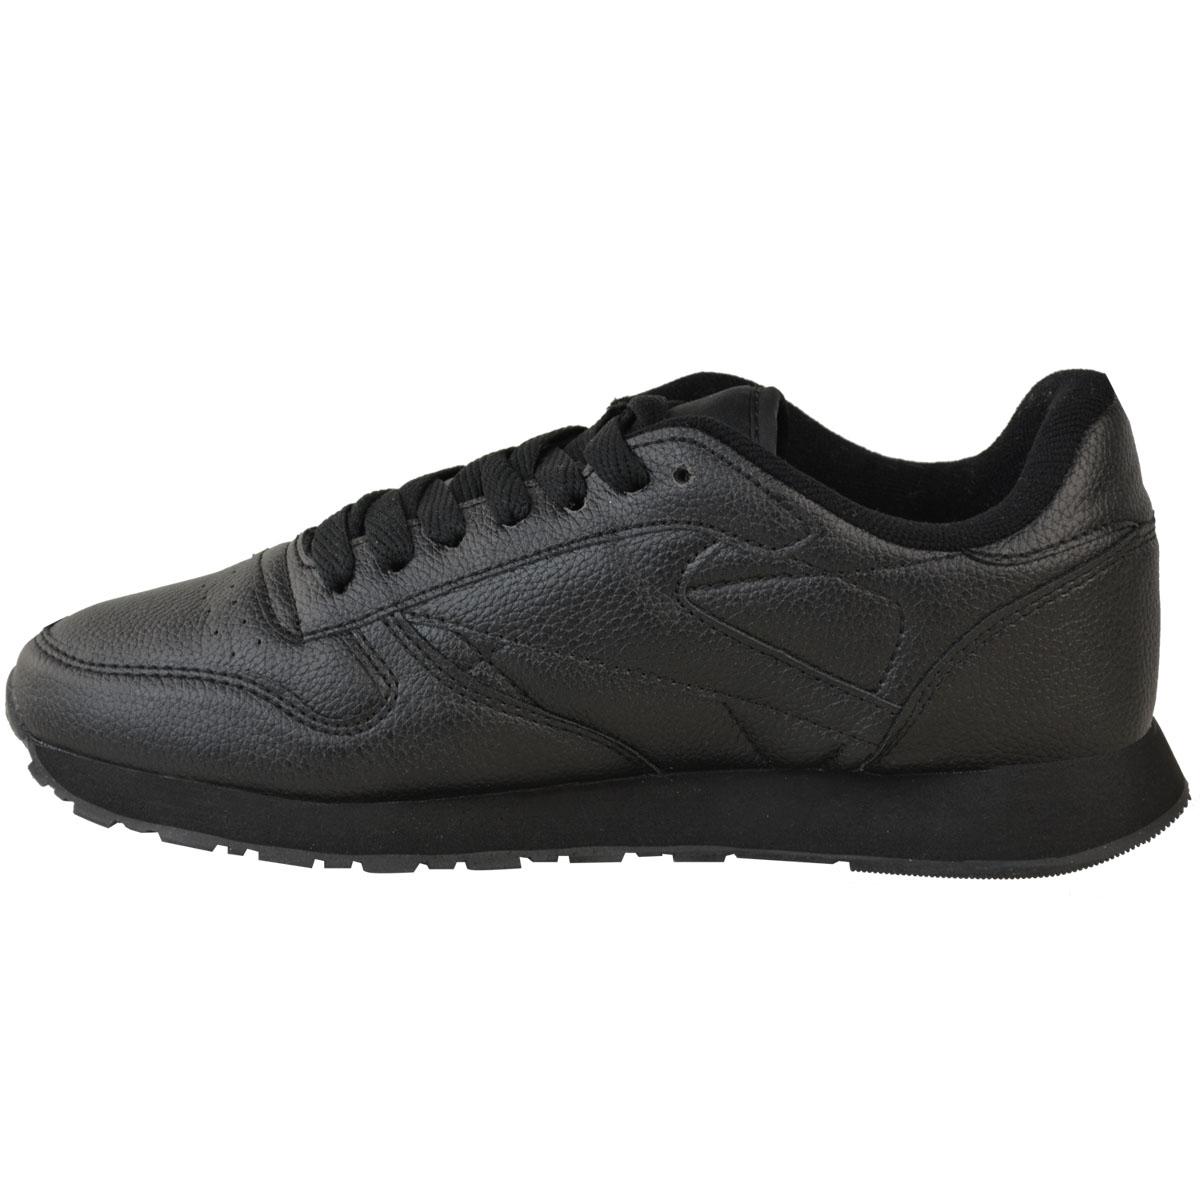 Mens Gym Shoes Amazon